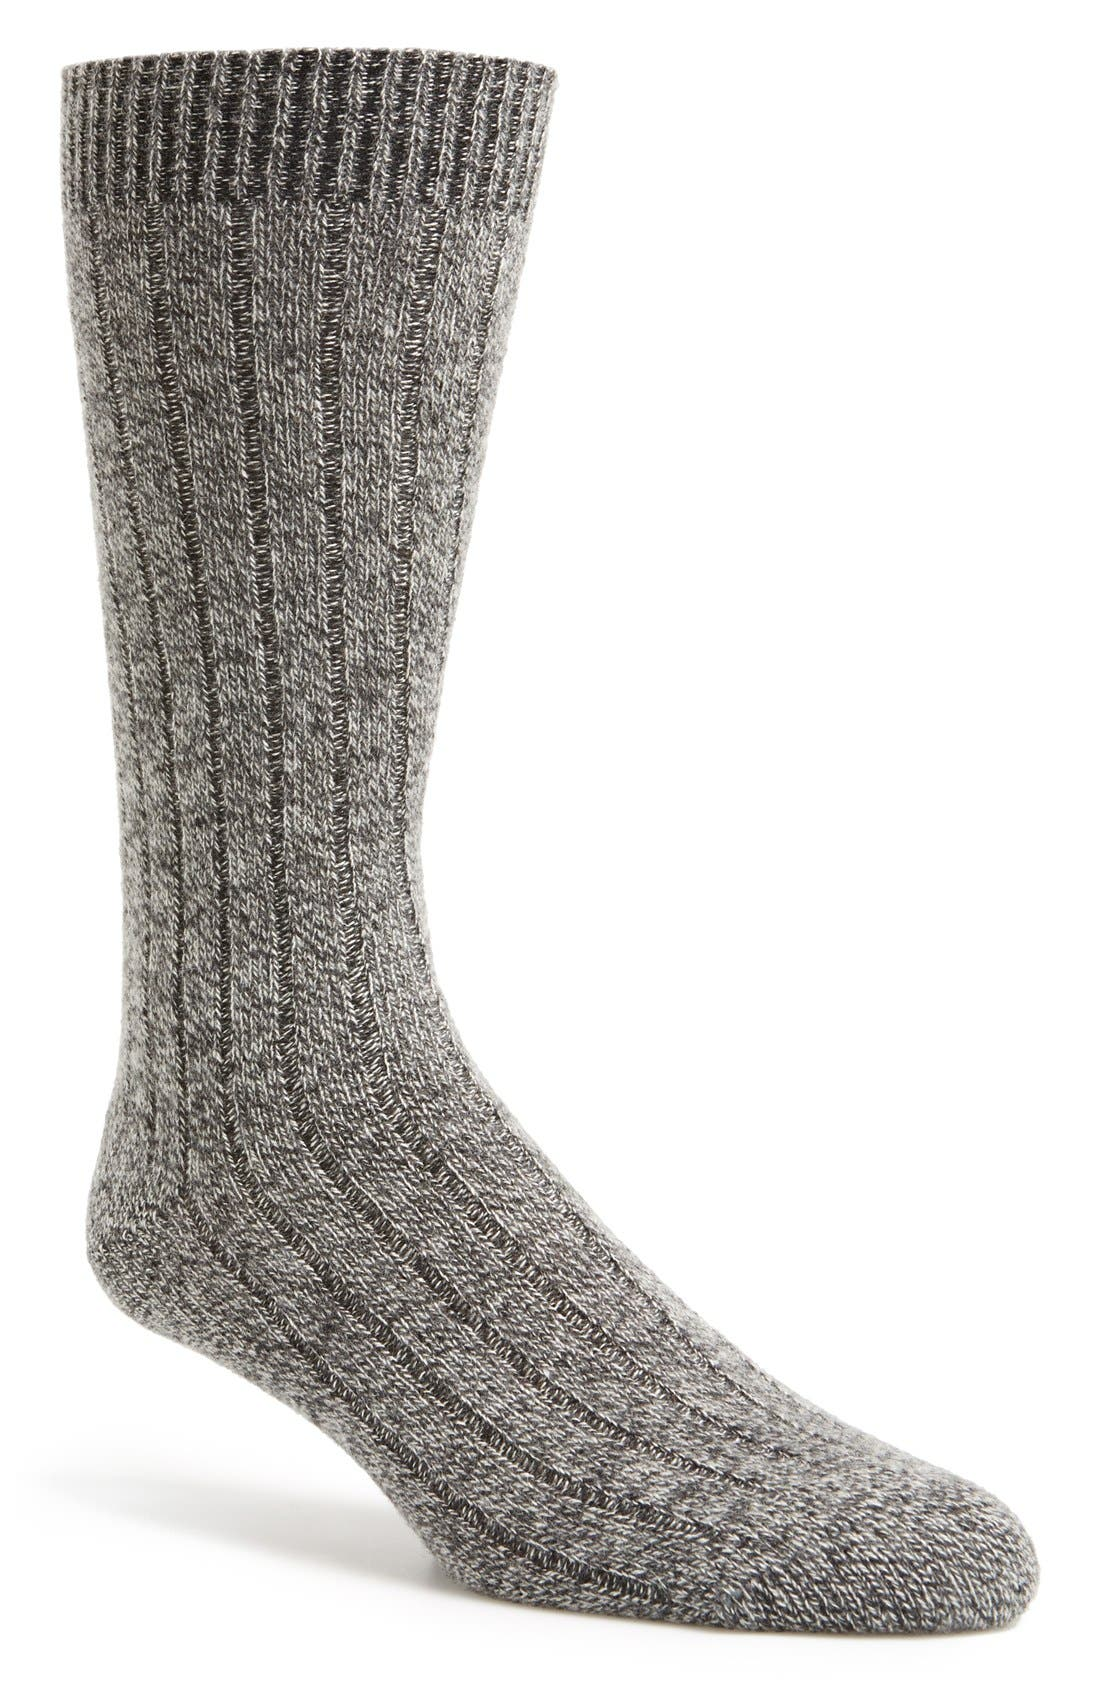 'Waddington' Cashmere Blend Mid Calf Socks,                             Main thumbnail 5, color,